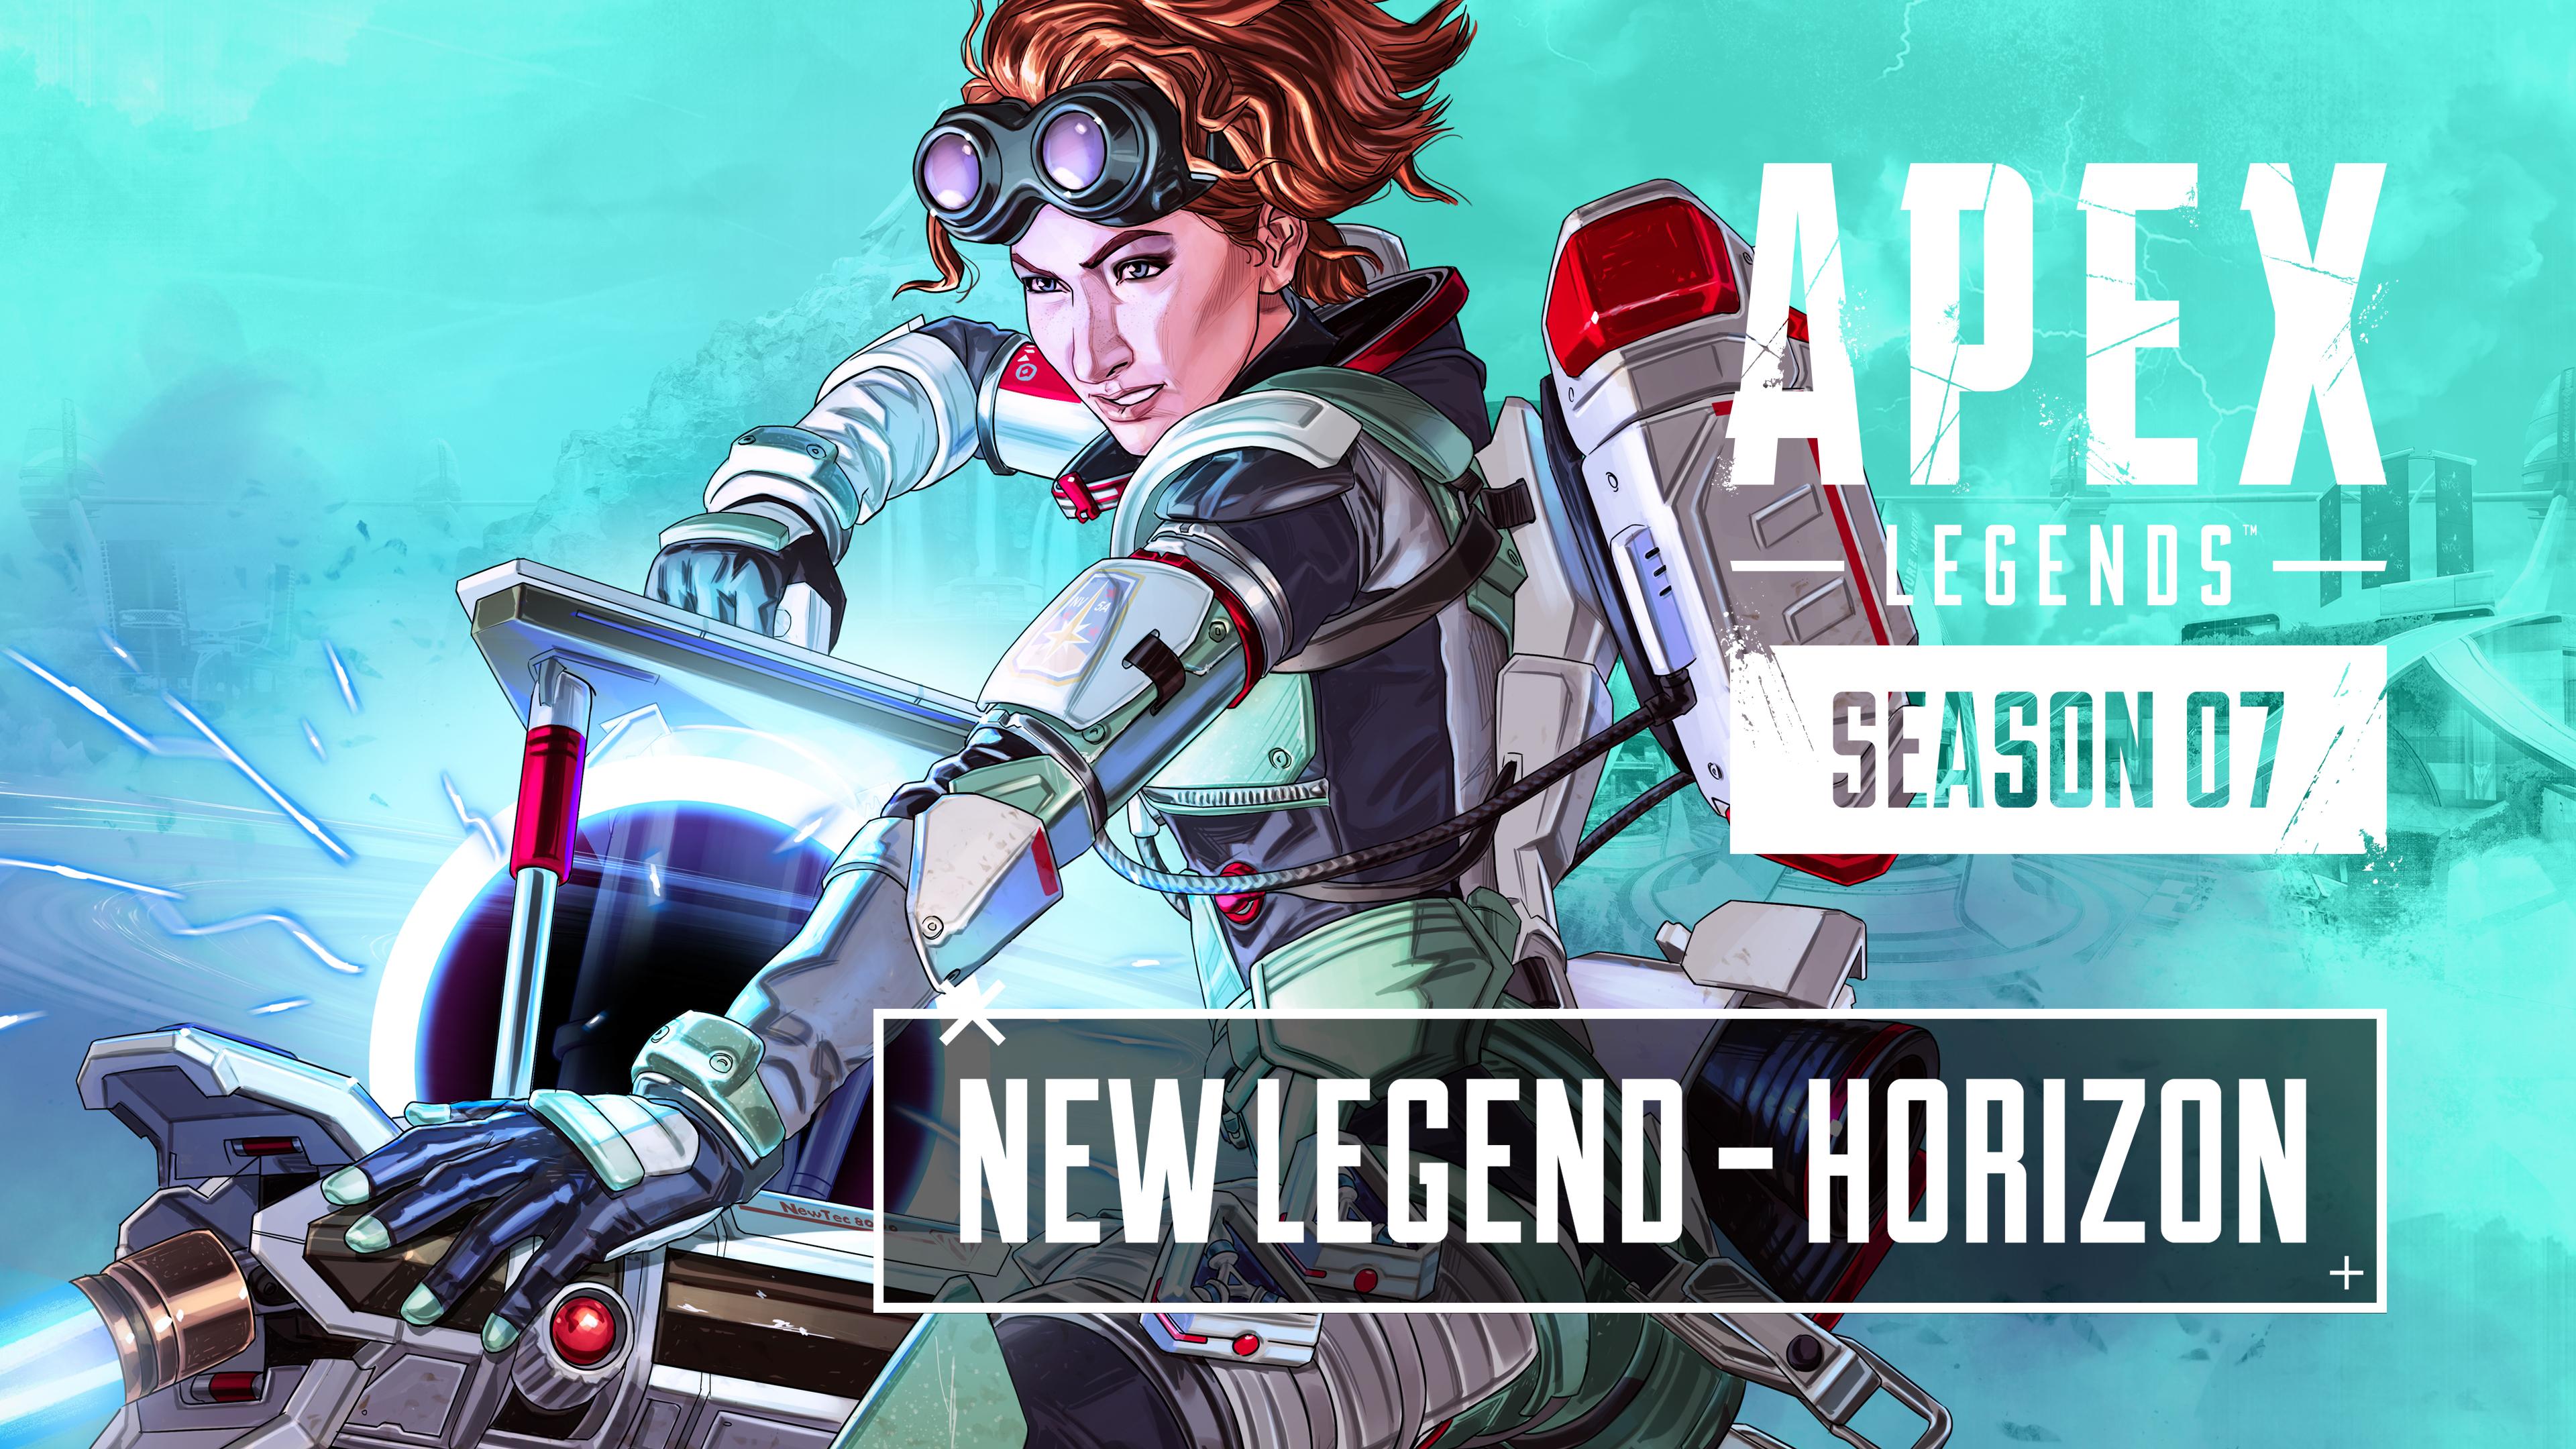 Apex_Thumbnail_Season_7_Legend_Horizon_1p